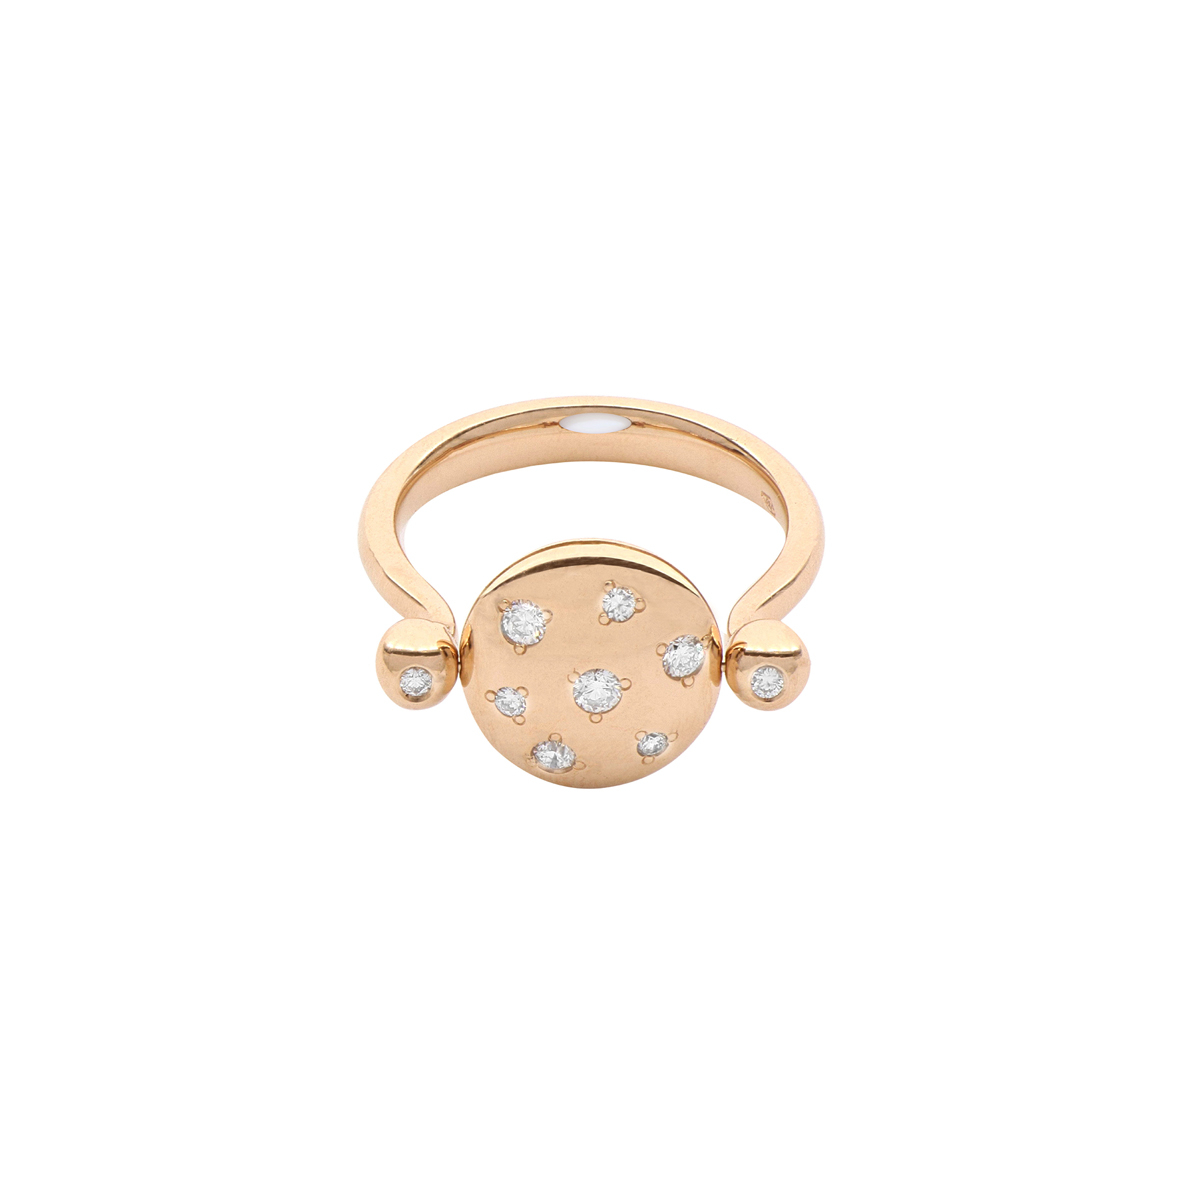 Reversible White Gem and White Diamond Disc Ring in 18 Kt Rose Gold